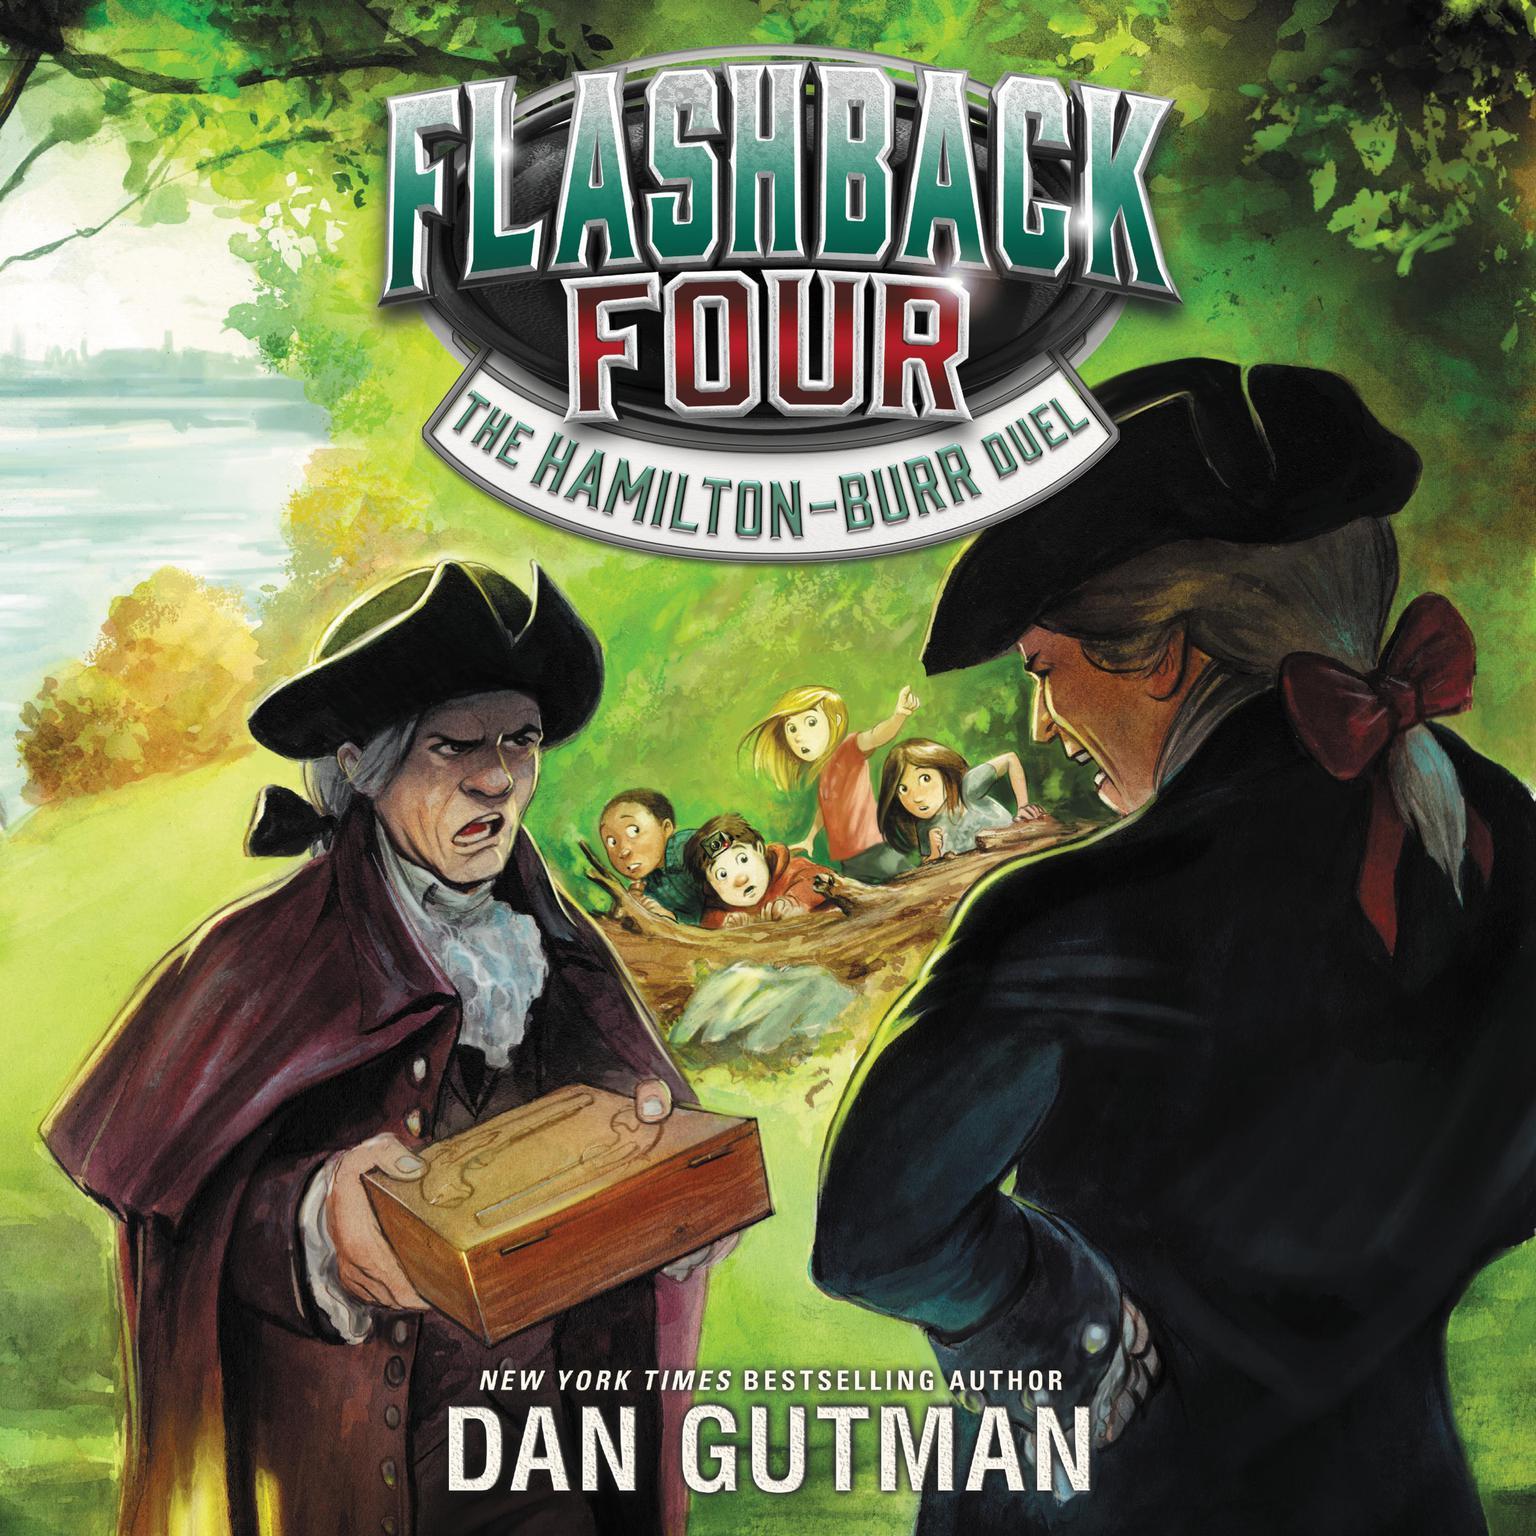 Printable Flashback Four #4: The Hamilton-Burr Duel Audiobook Cover Art